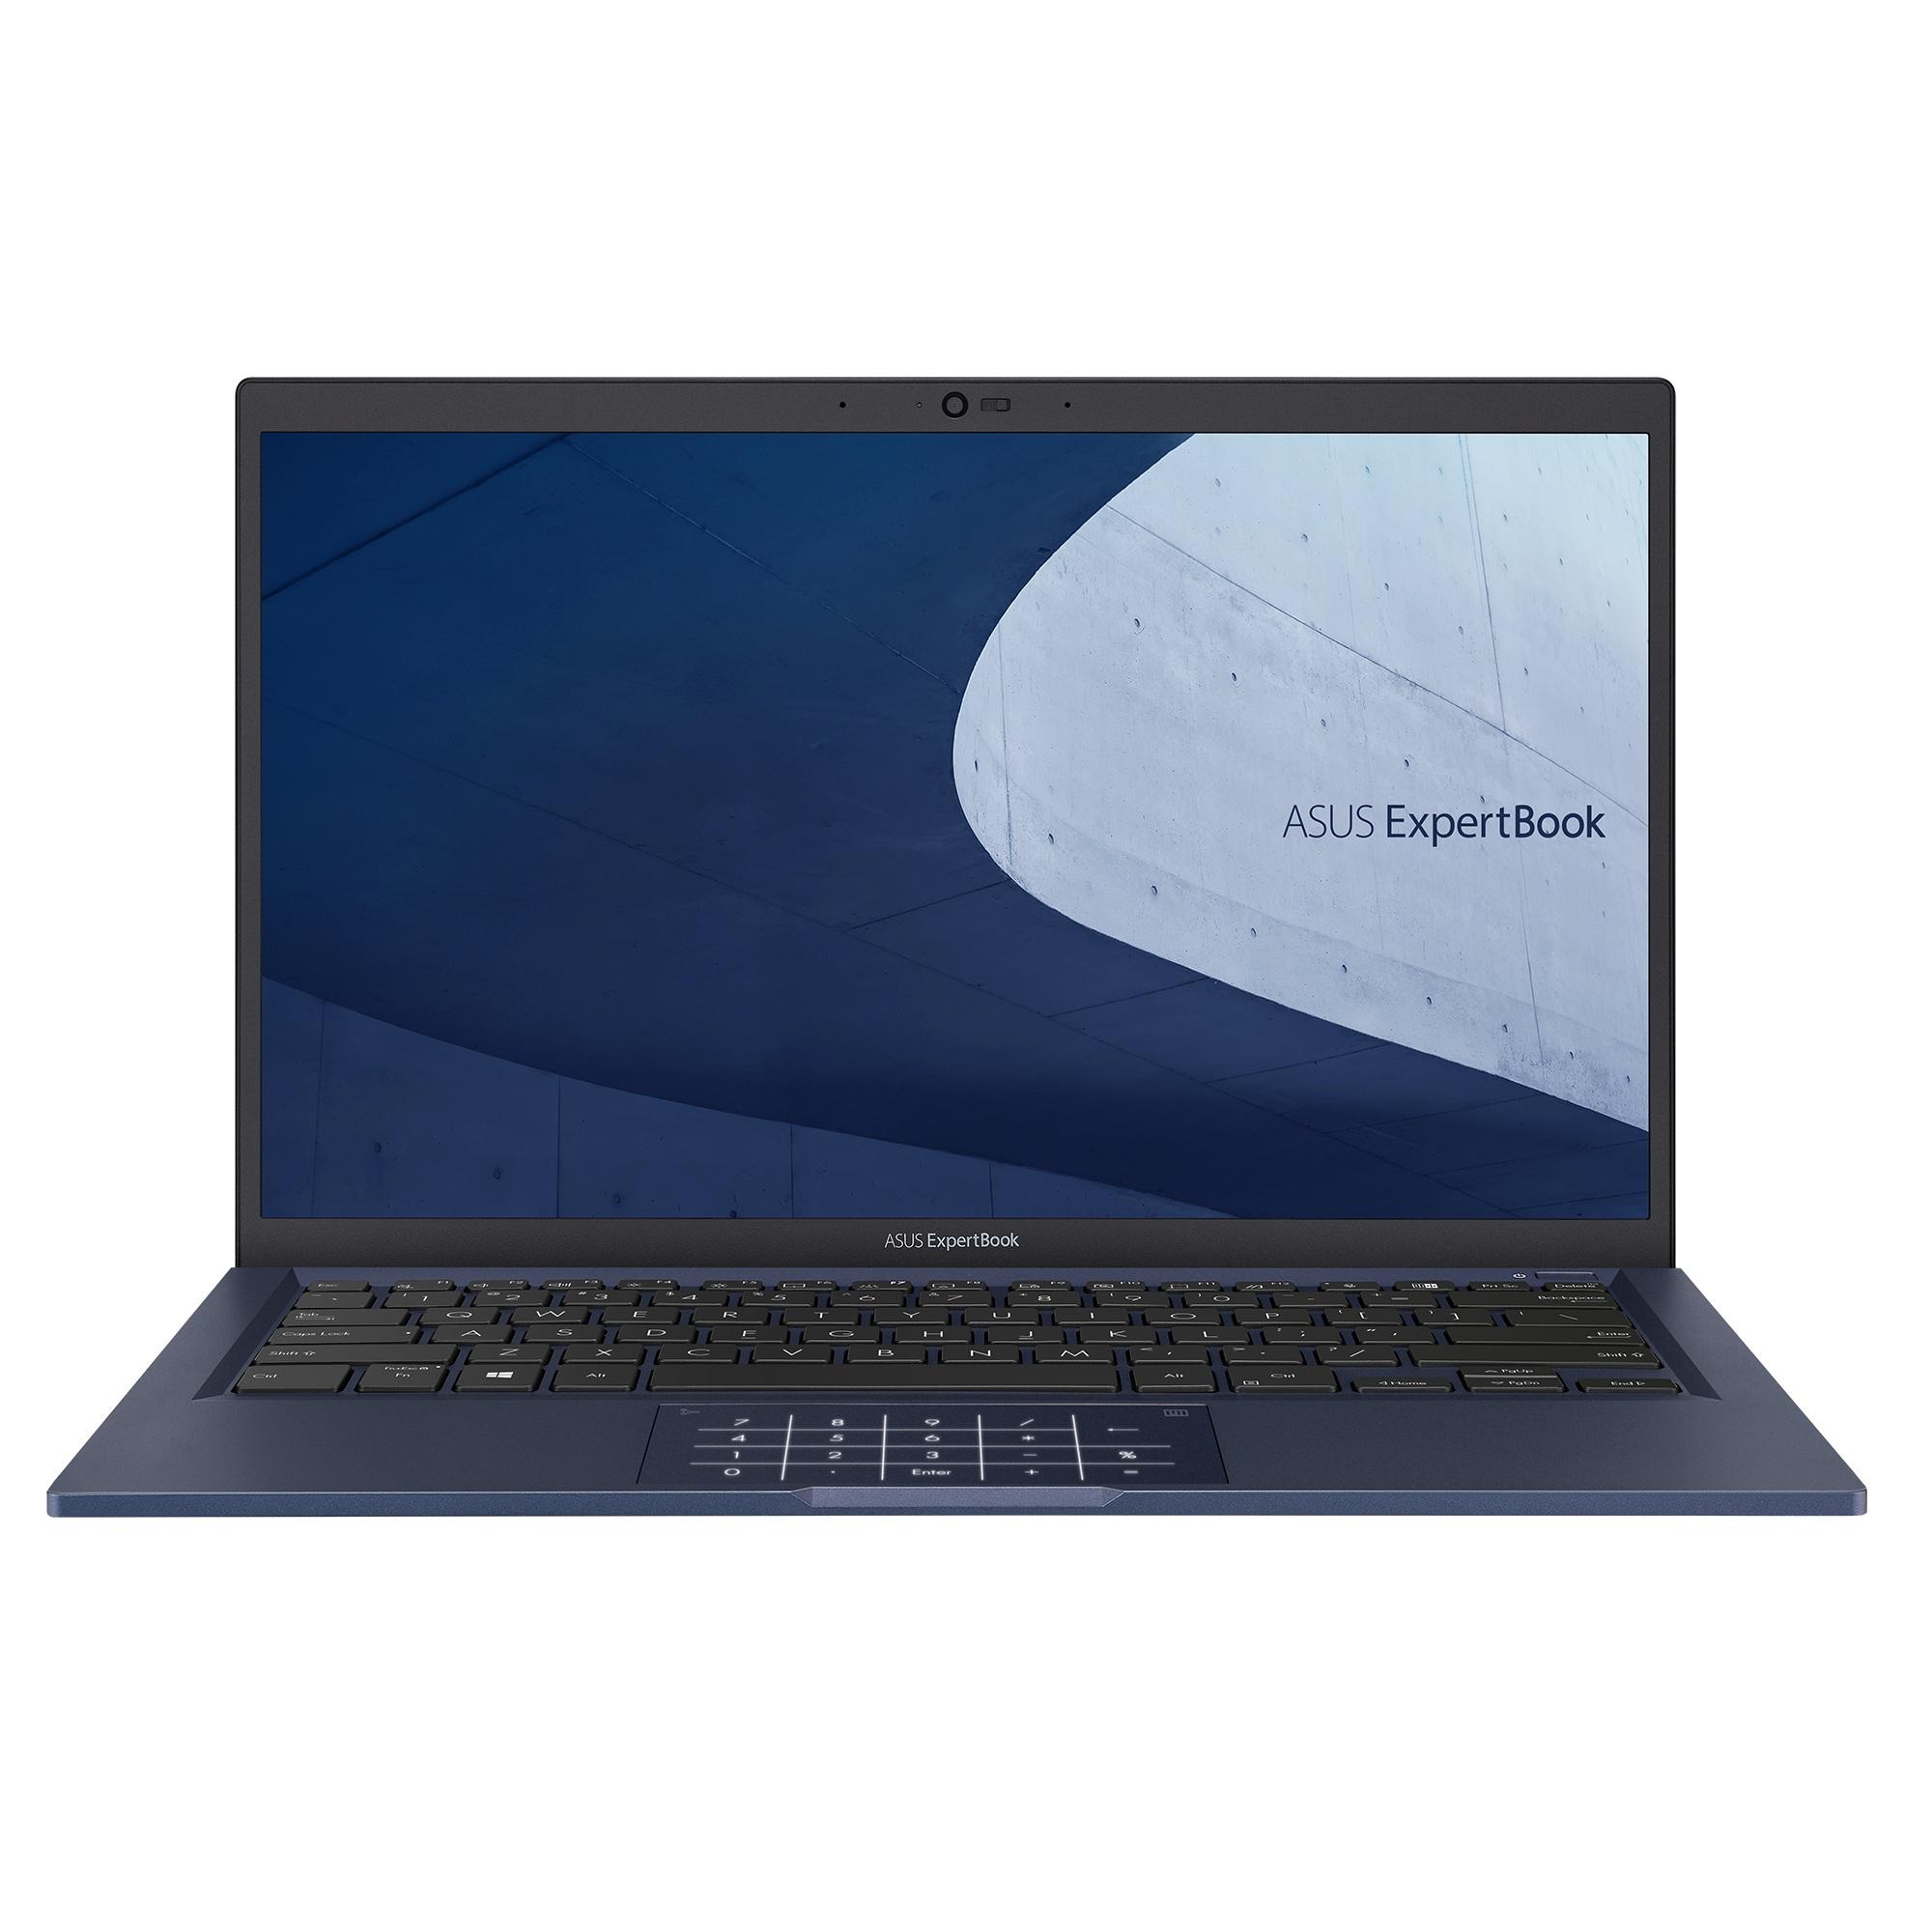 ASUS ExpertBook B1400/14''/i5-1135G7 (4C/8T)/16GB/512GB SSD/FPR/TPM/W10P/Black/2Y PUR - B1400CEAE-EB2521R